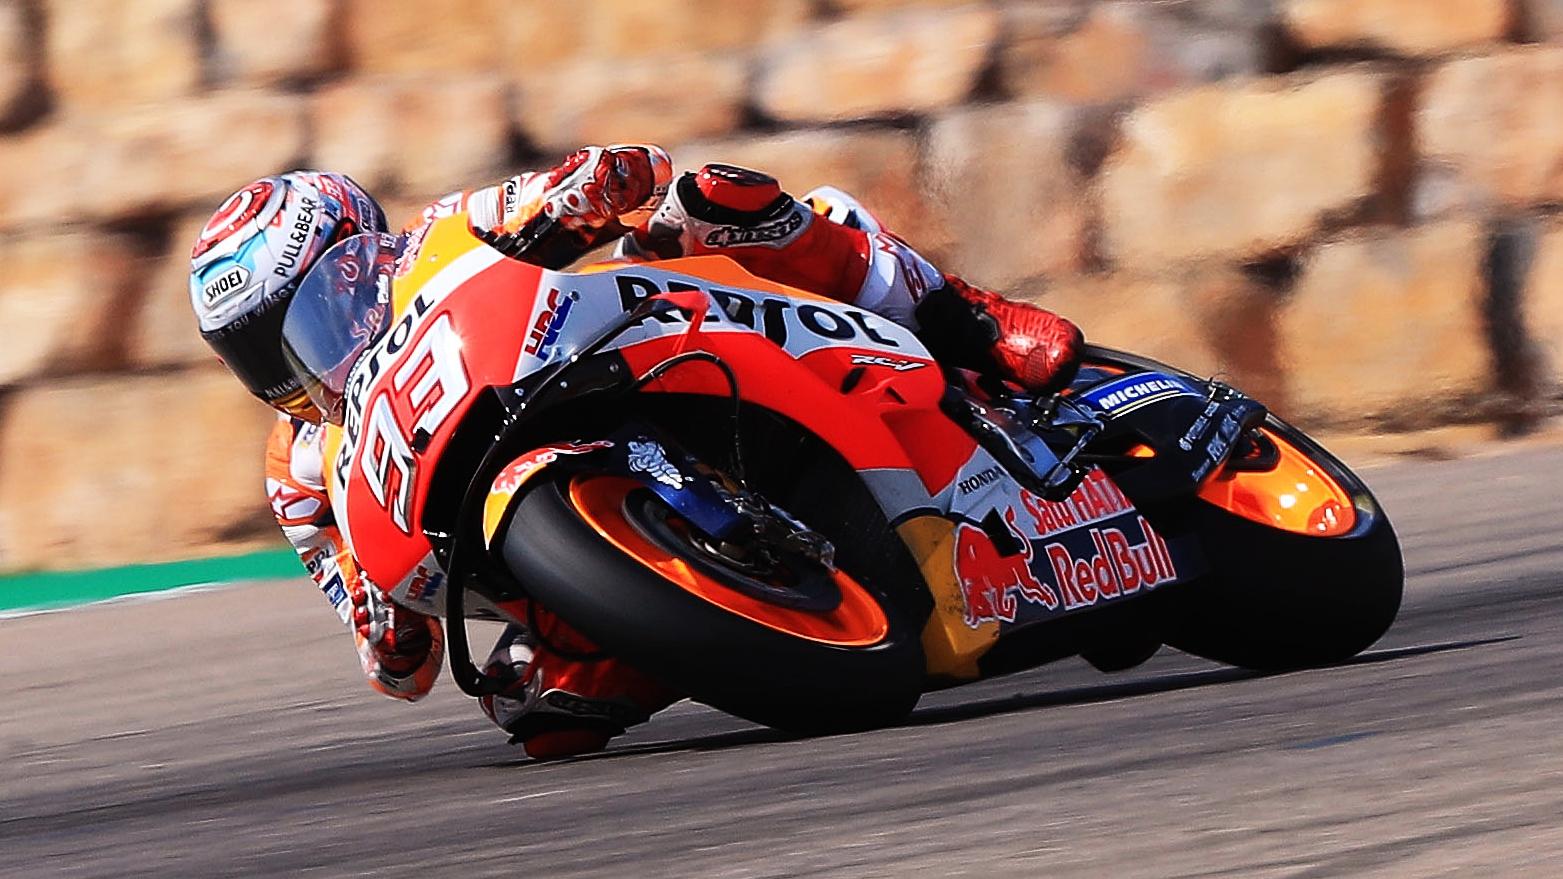 Marc Márquez derrota a Andrea Dovizioso en un duelo colosal de MotoGP en Aragón